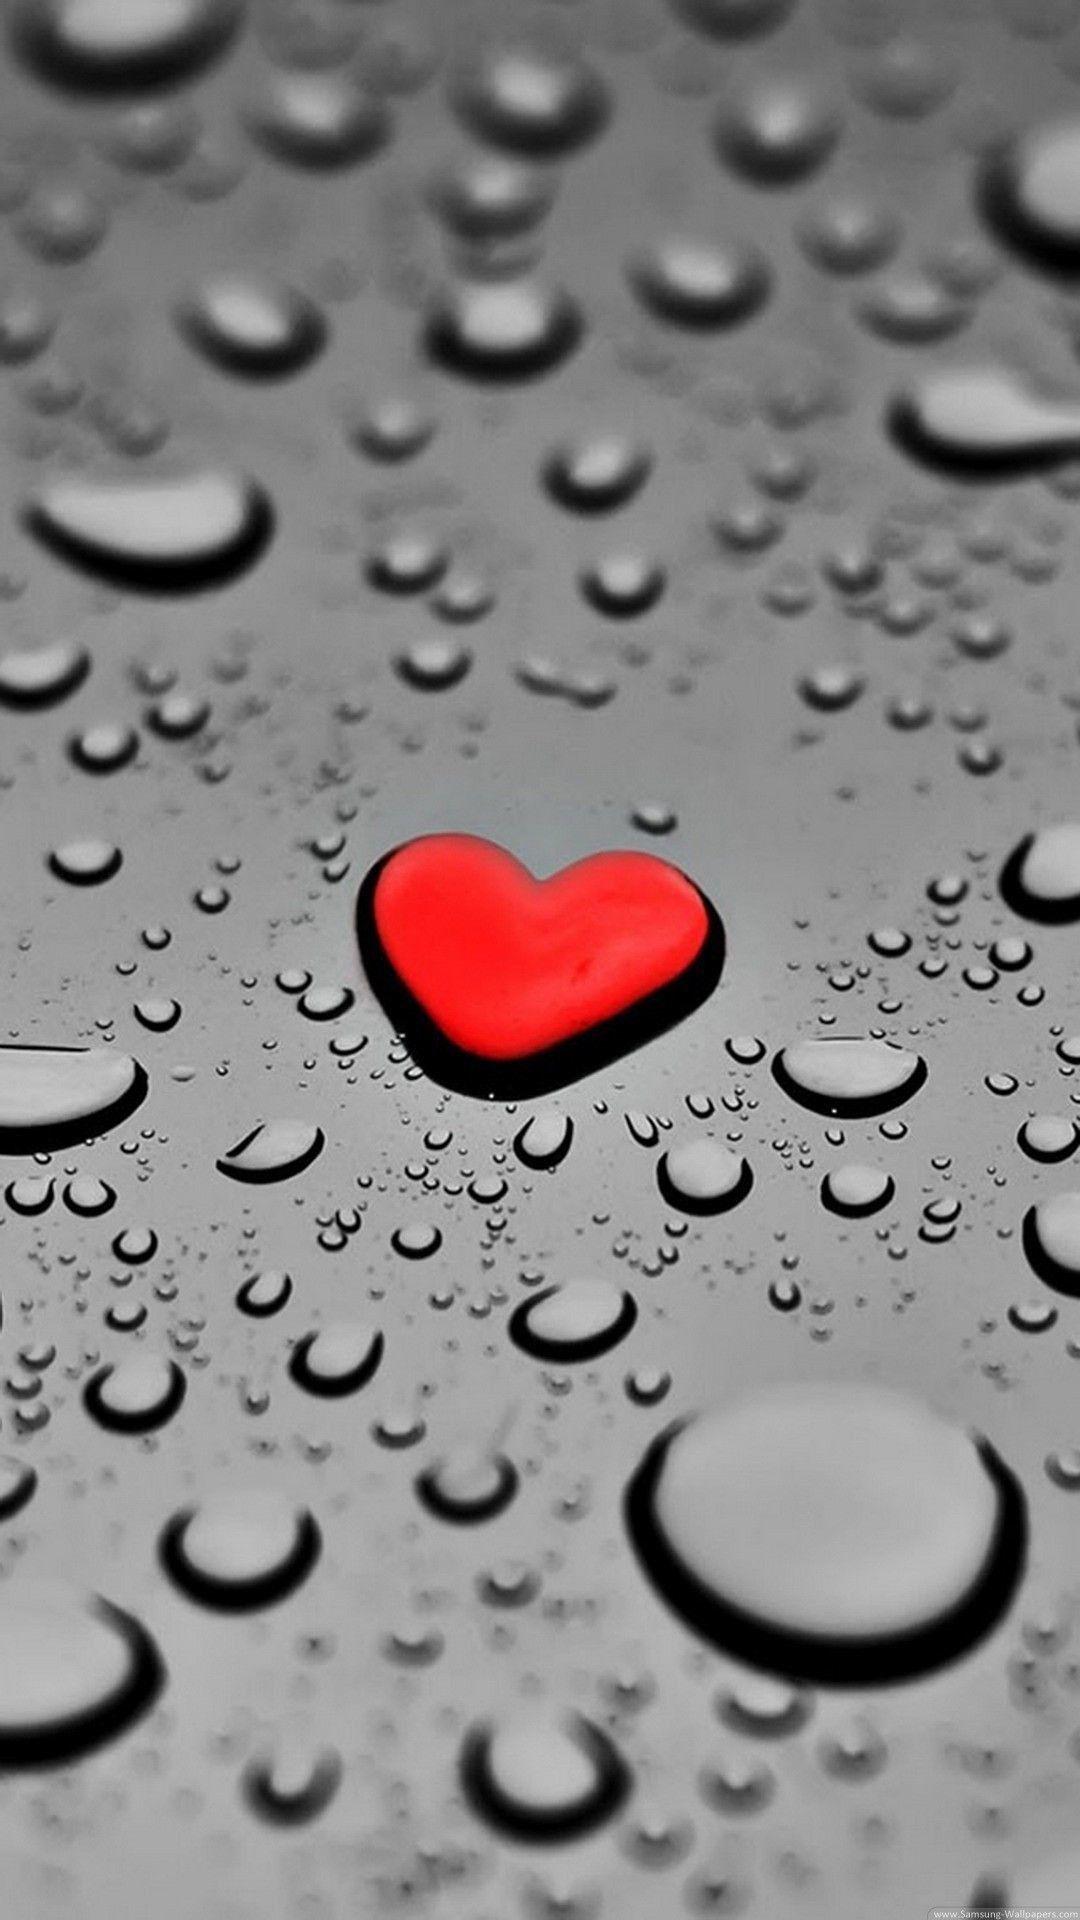 Love Keyboard Wallpaper Iphone In 2020 Valentines Wallpaper Iphone Valentines Wallpaper Funny Phone Wallpaper